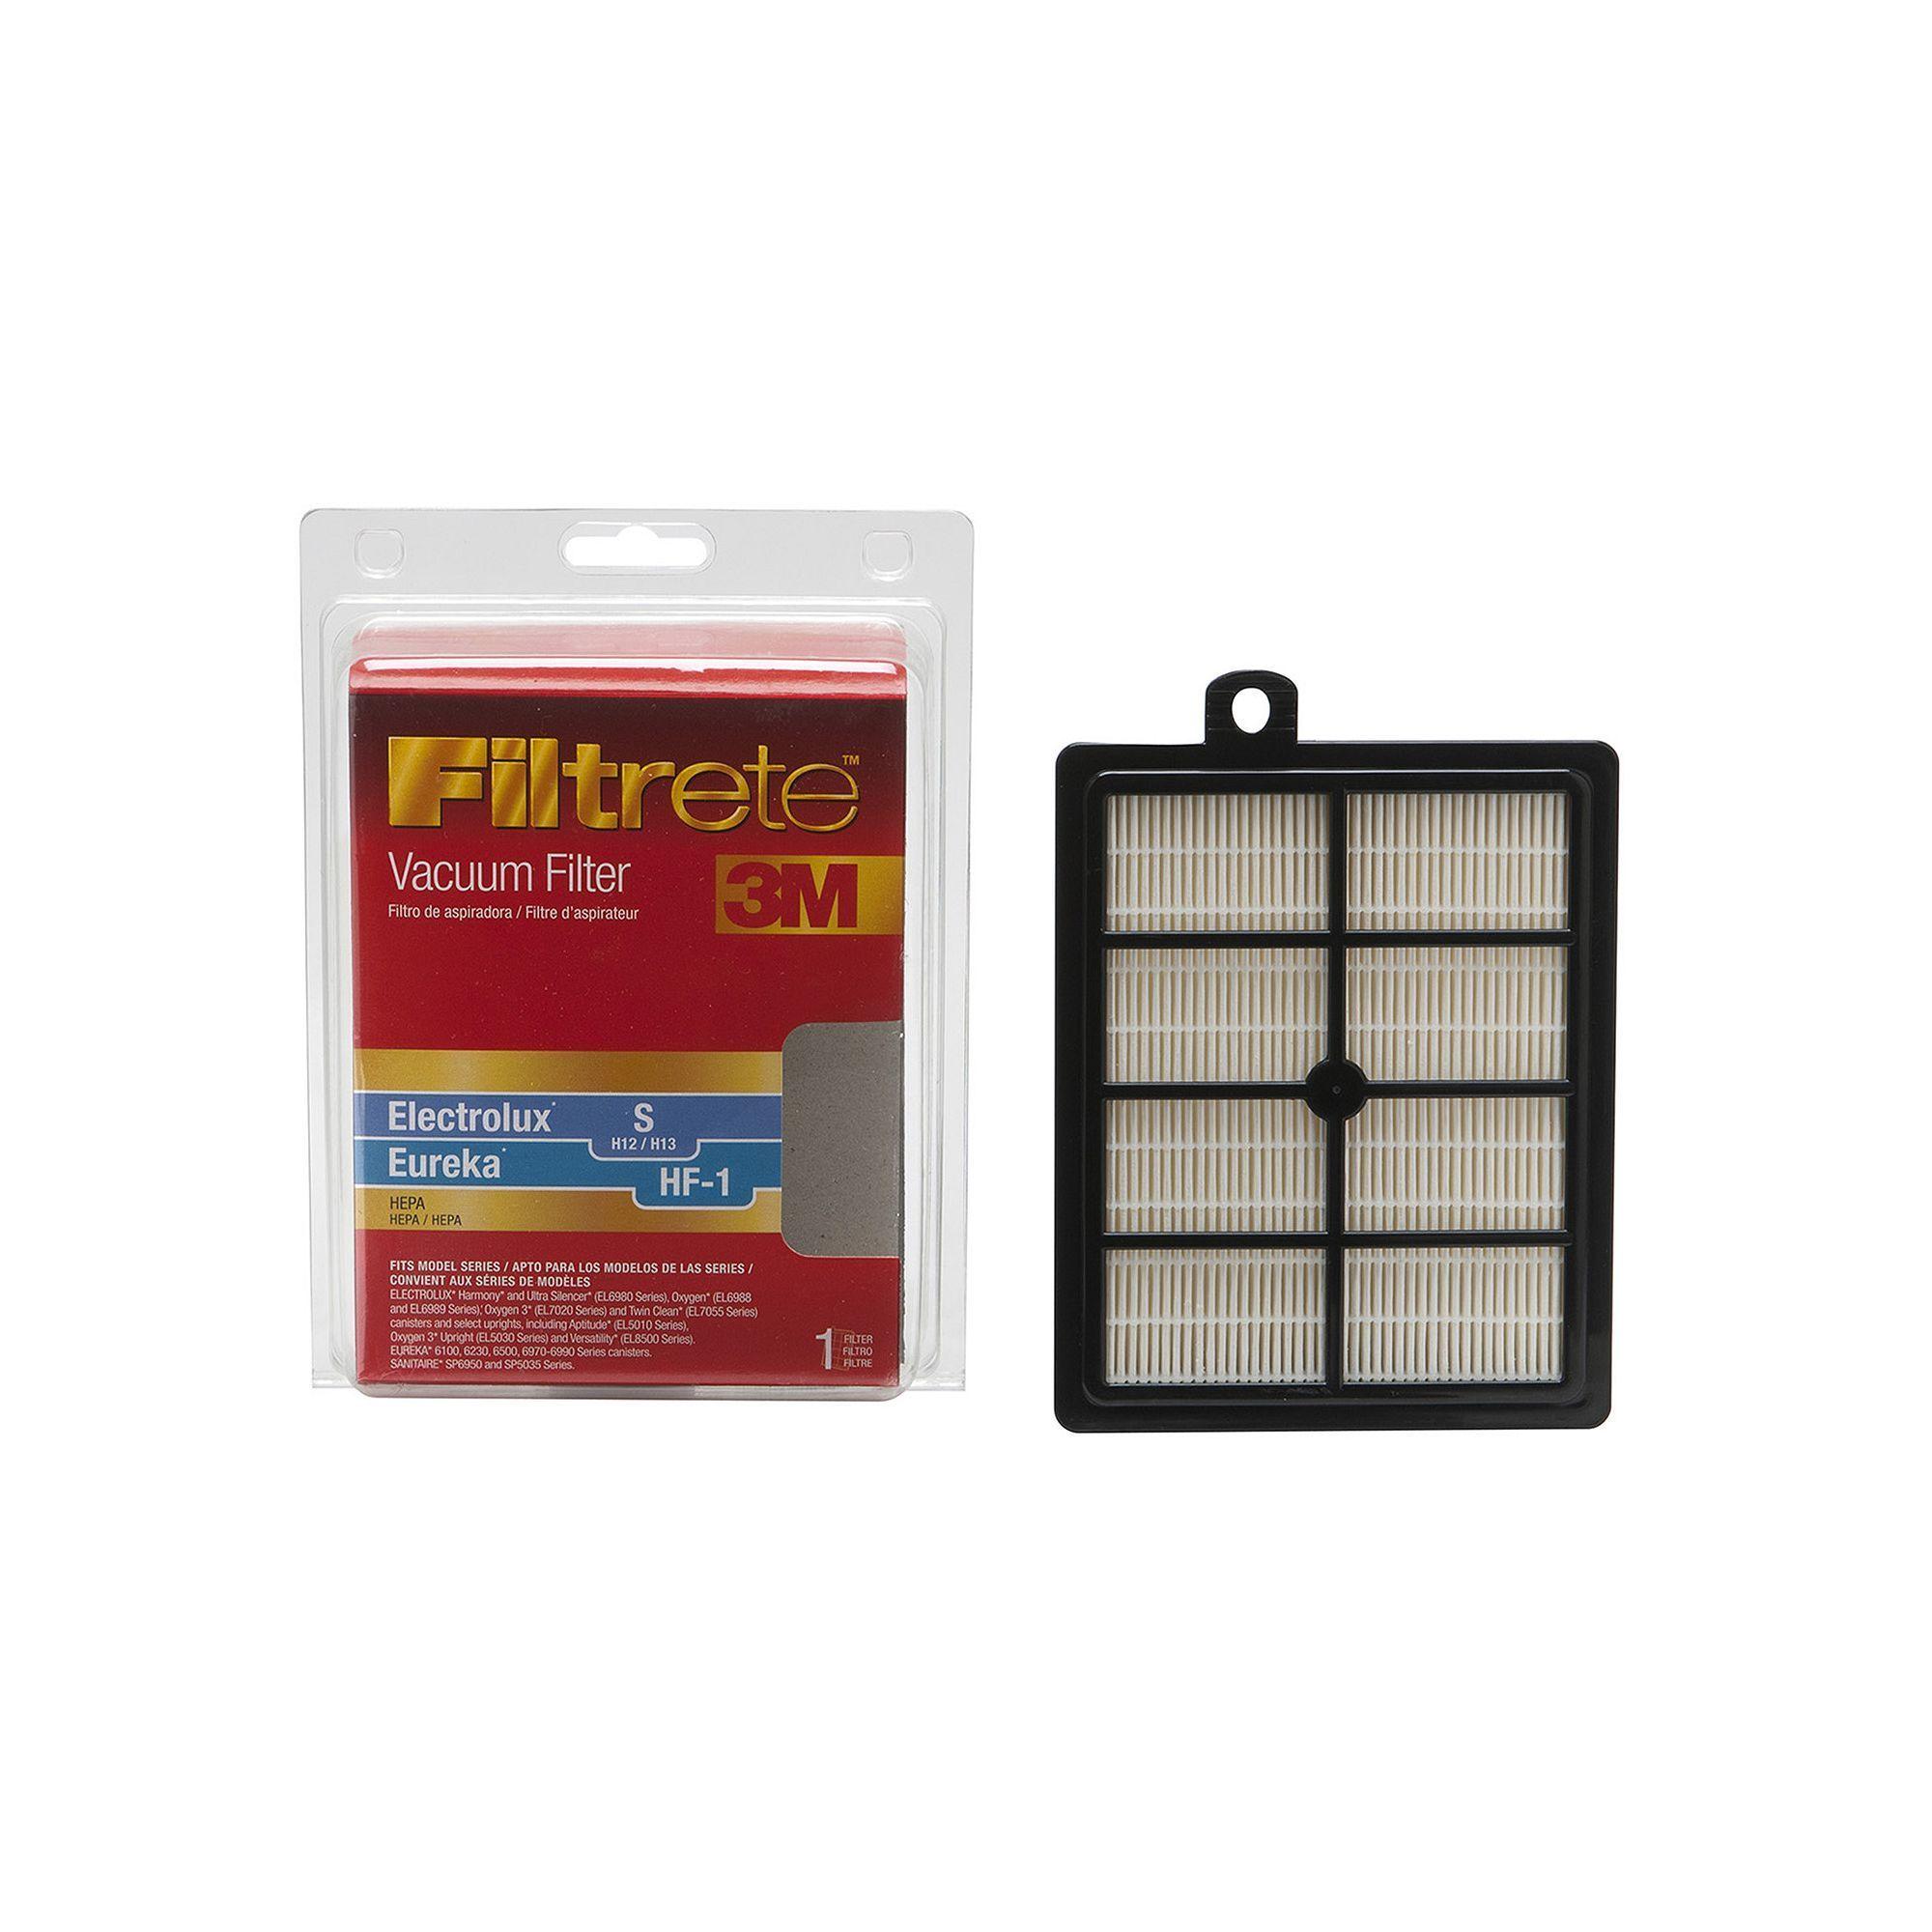 3M Filtrete Electrolux S & Eureka HF1 HEPA Vacuum Filter